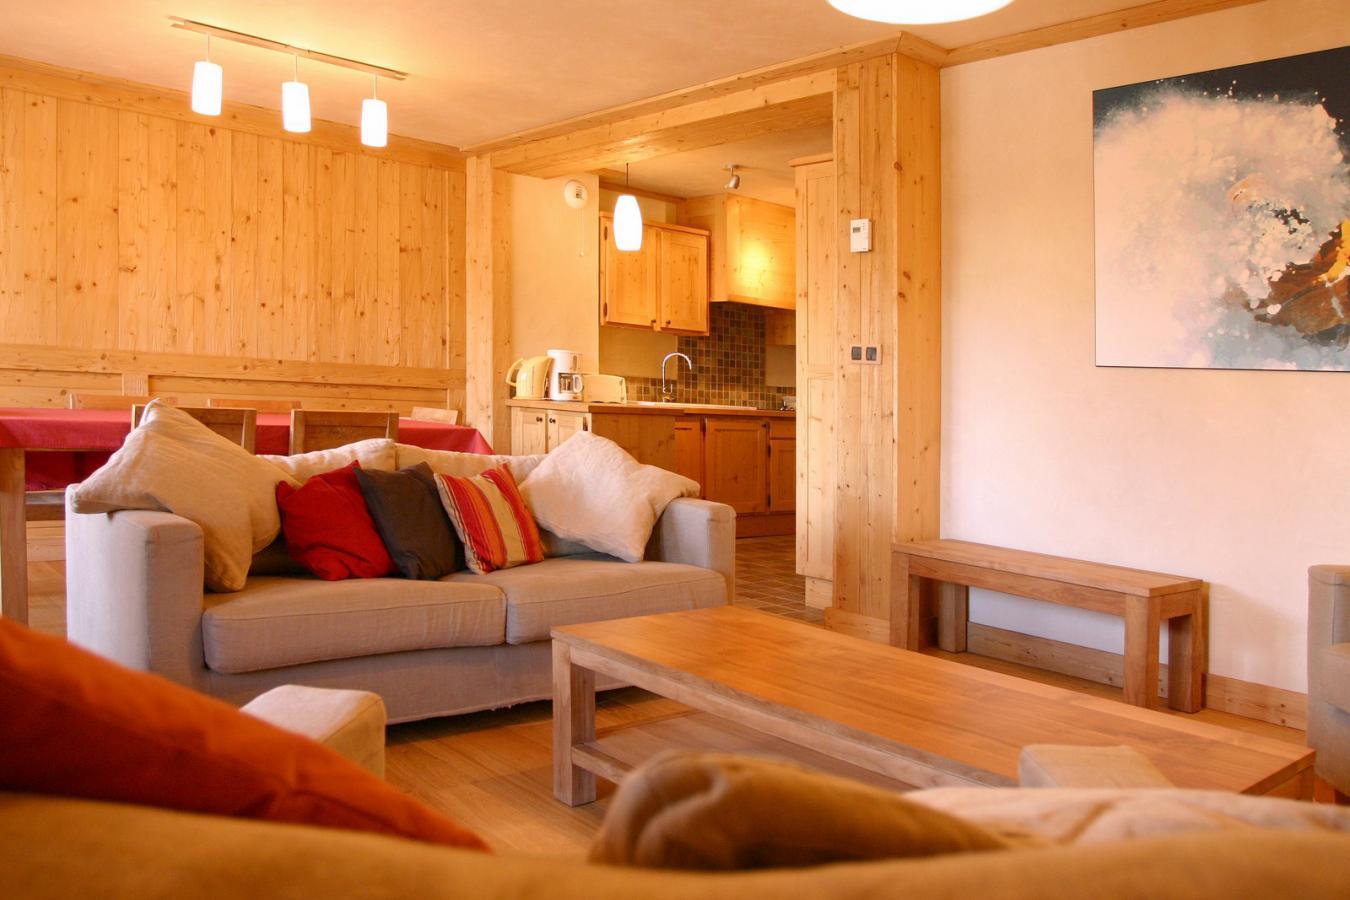 r sidence le cortina les 2 alpes location vacances ski les 2 alpes ski planet. Black Bedroom Furniture Sets. Home Design Ideas